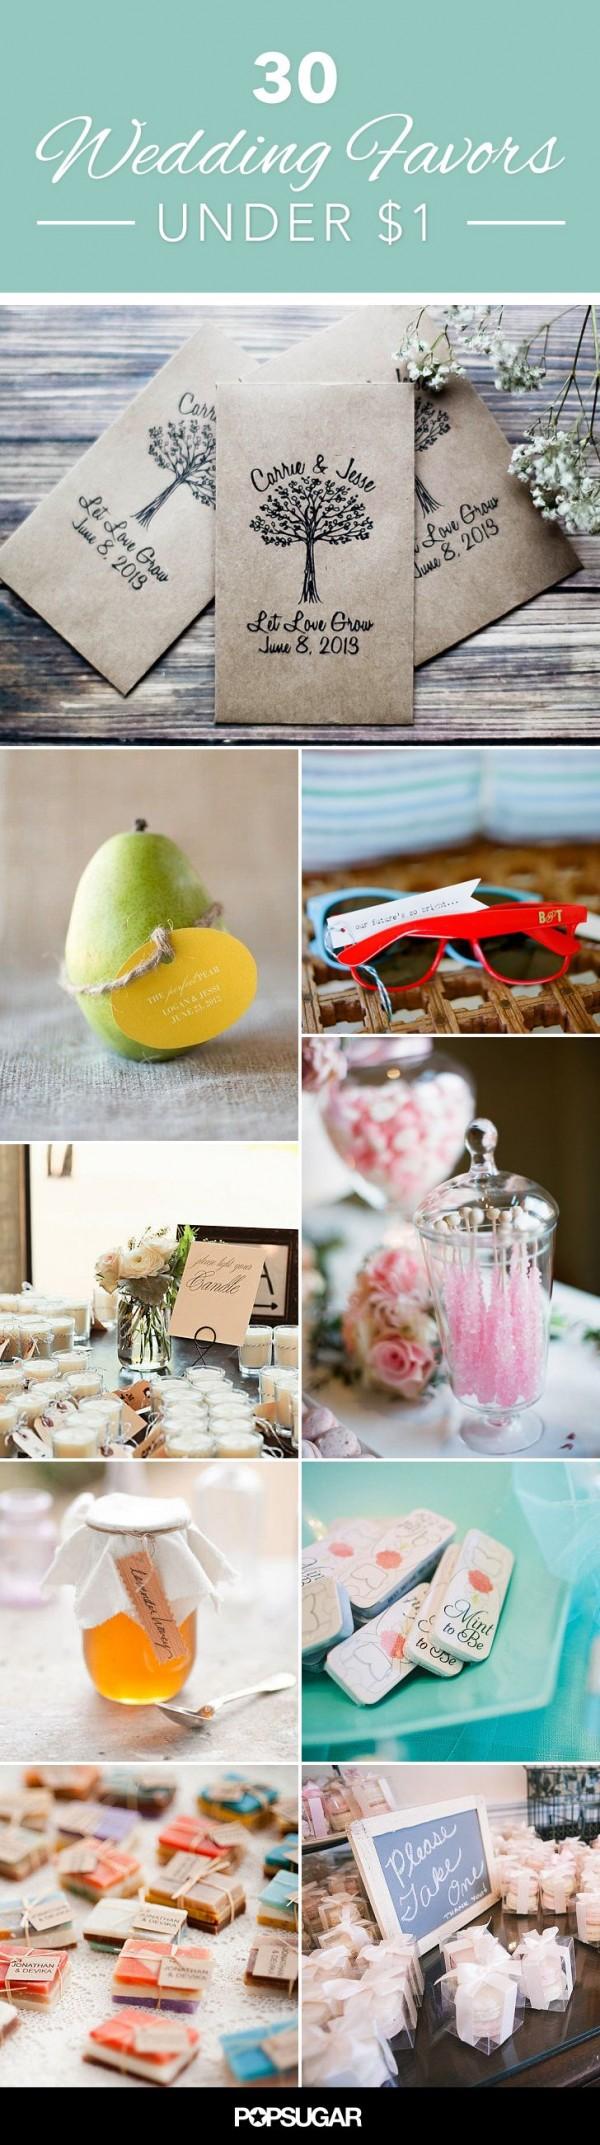 Wedding favors under 1 diy weddings for Cheap wedding themes